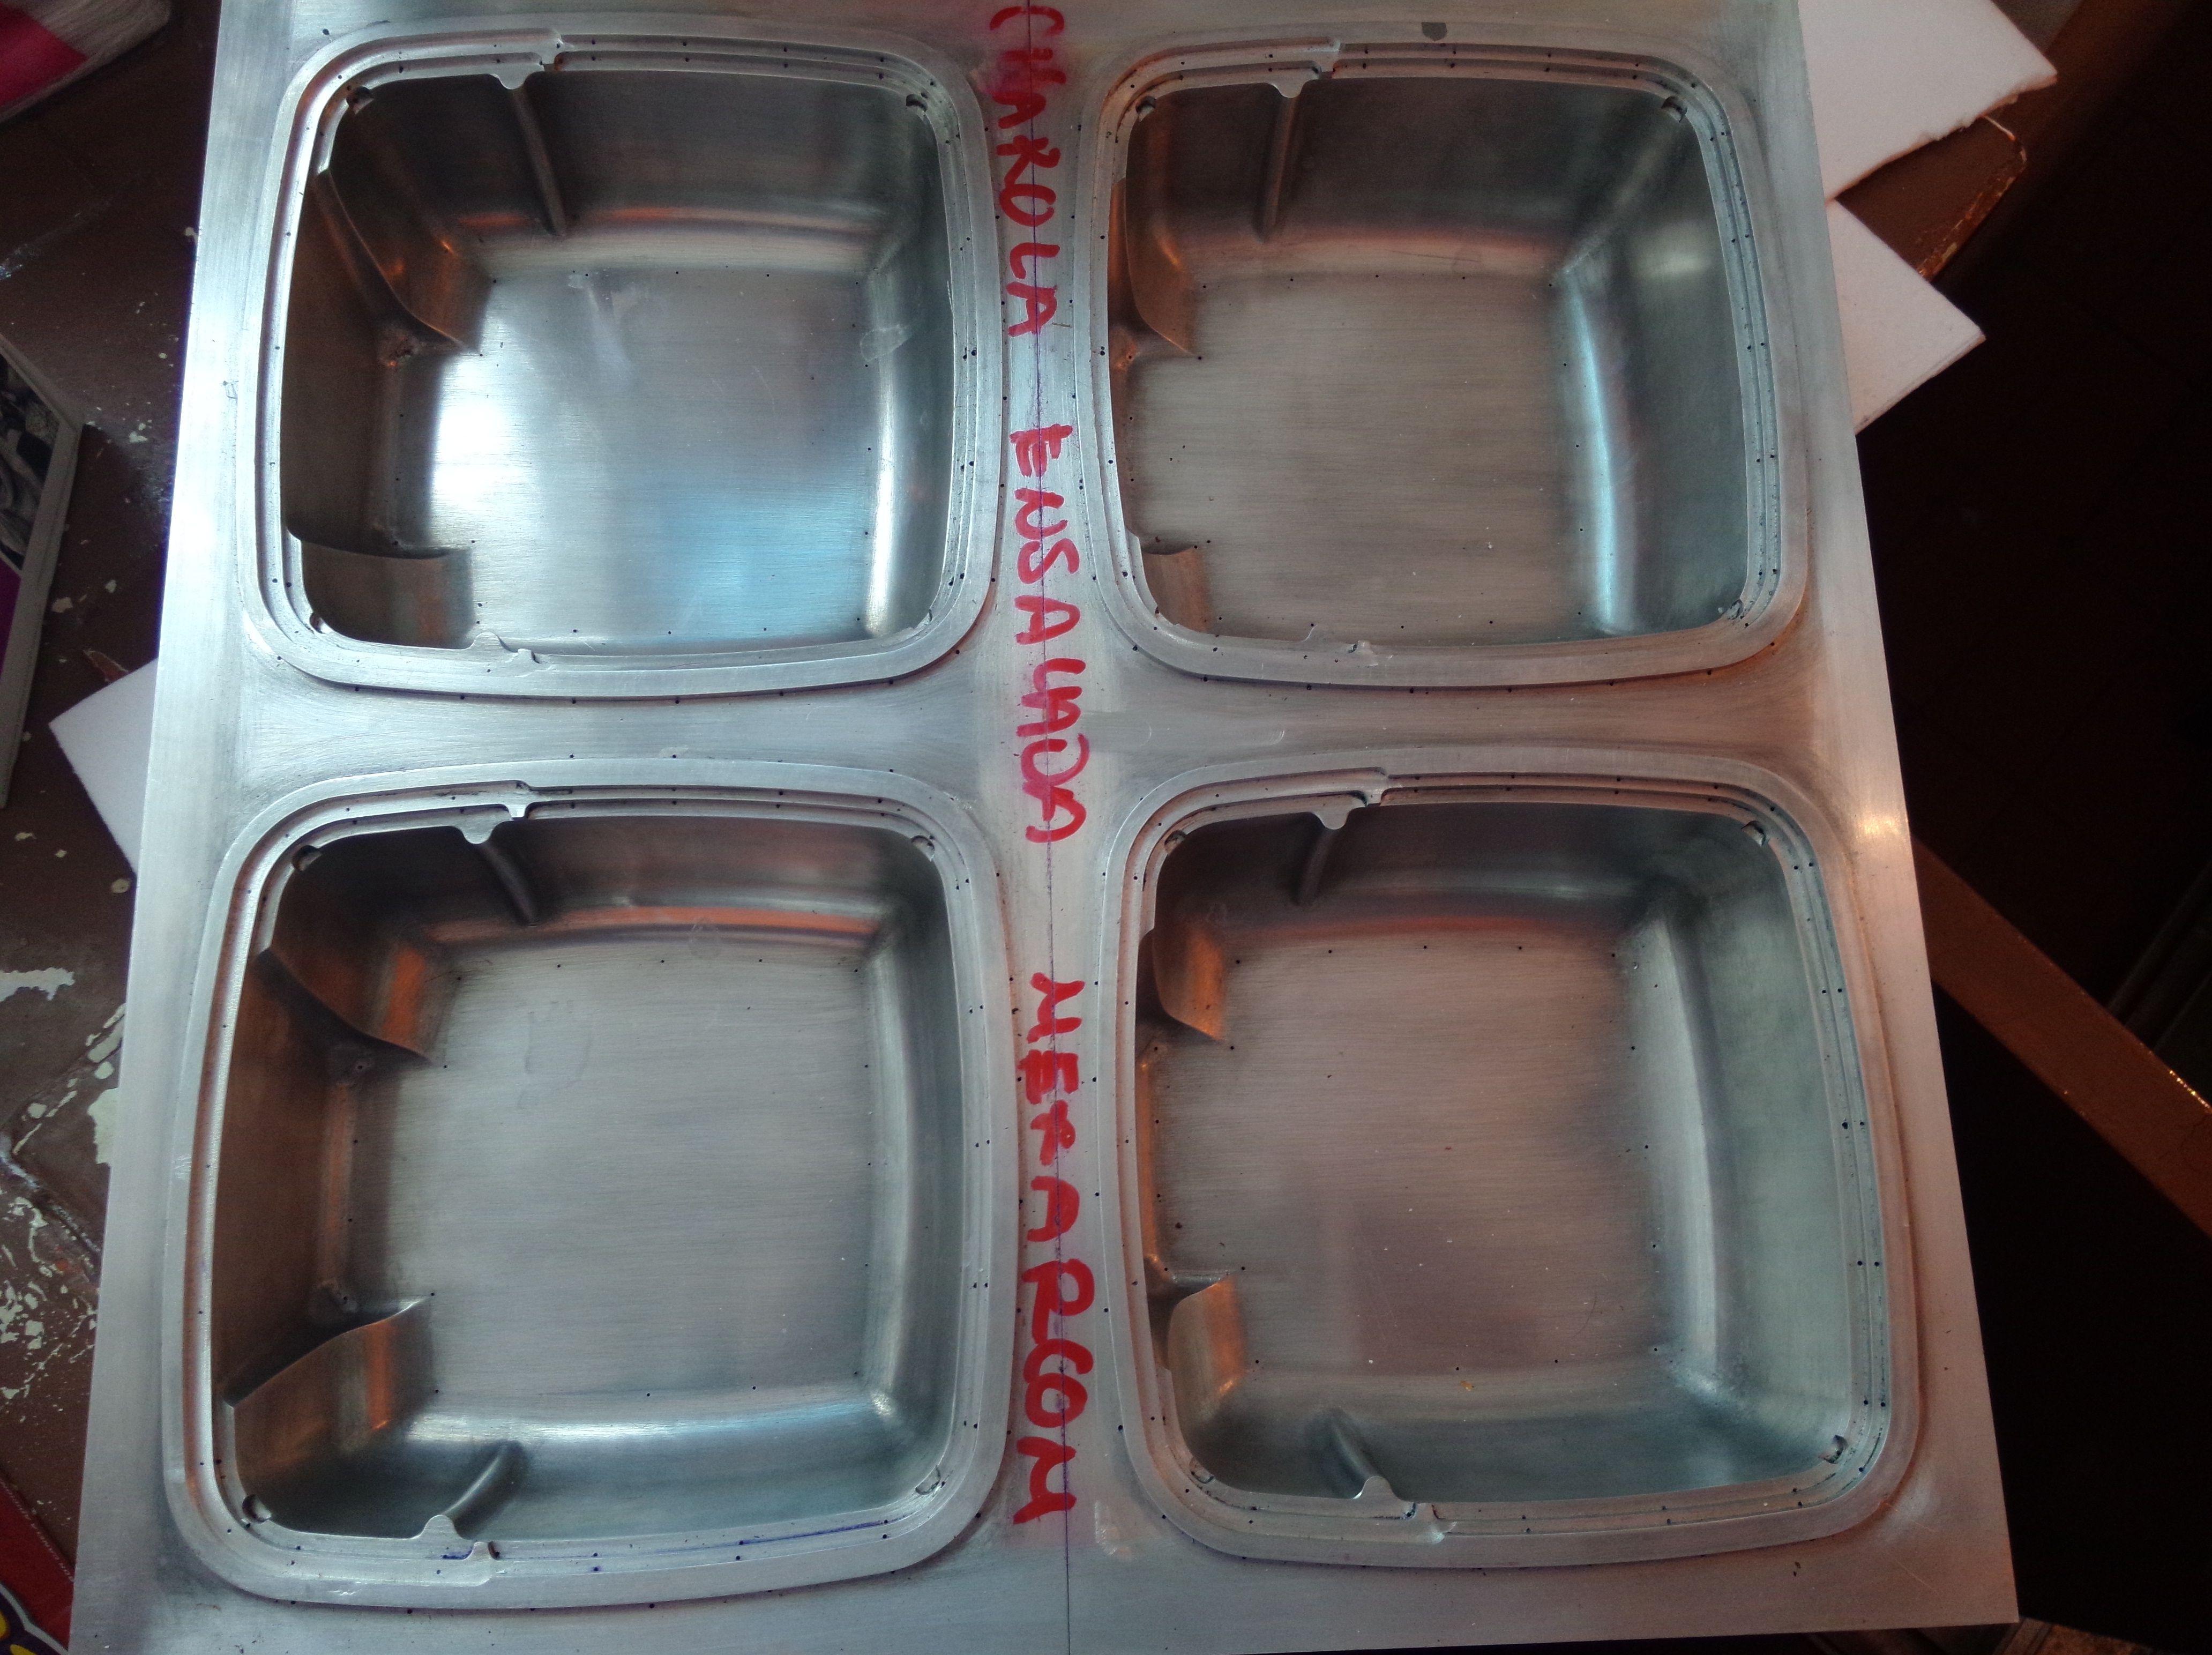 Matriz de termoformado para charola de ensaladas.